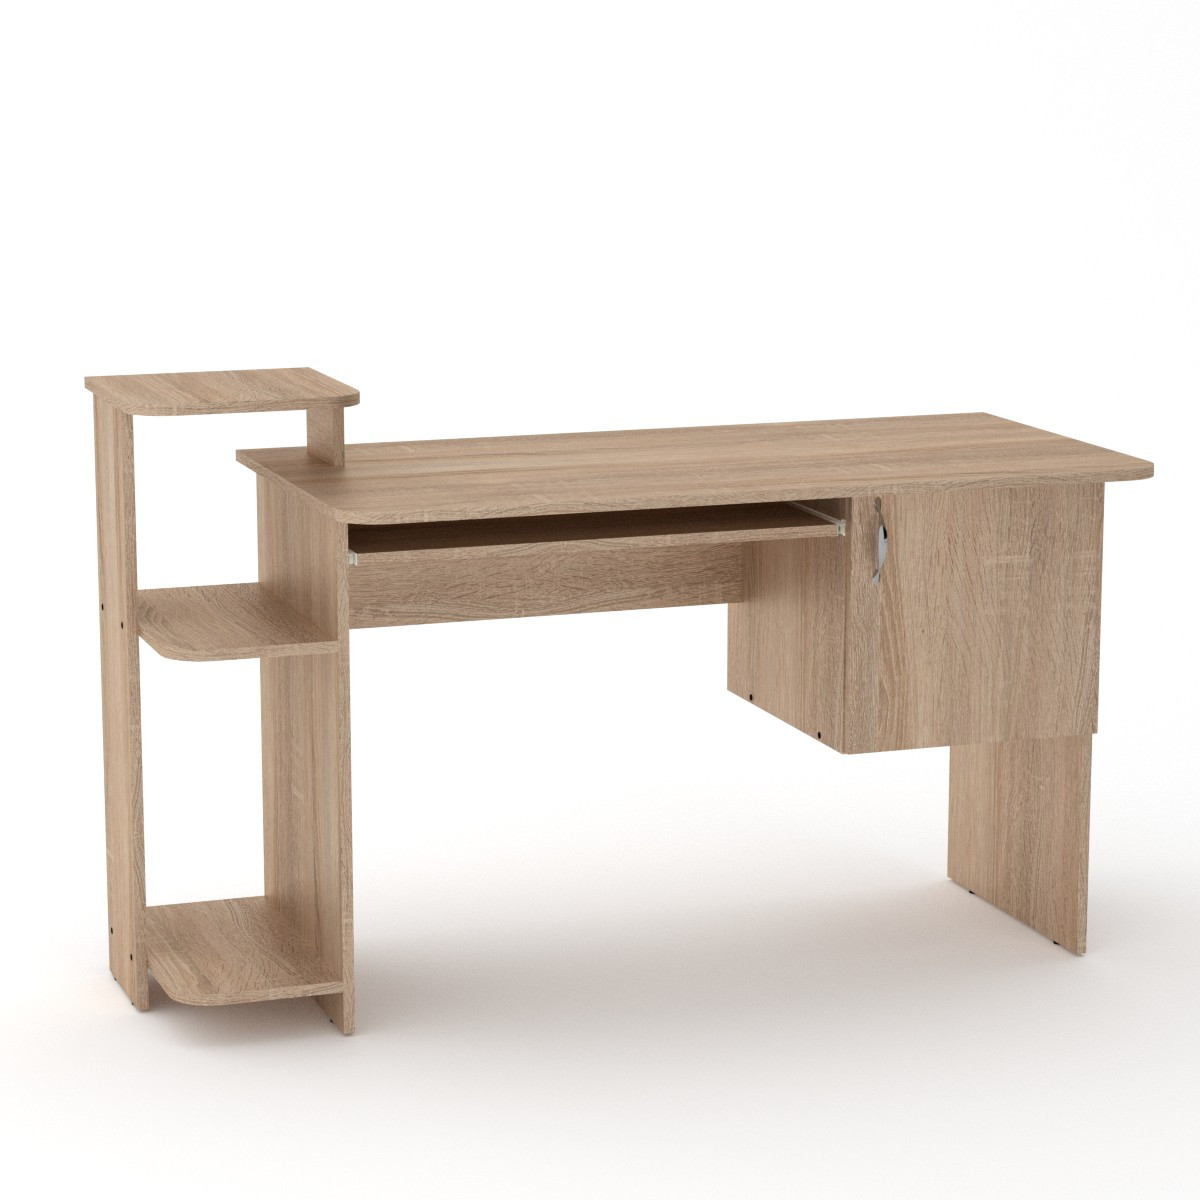 Стол компьютерный СКМ-3 дуб сонома Компанит (142х60х87 см)